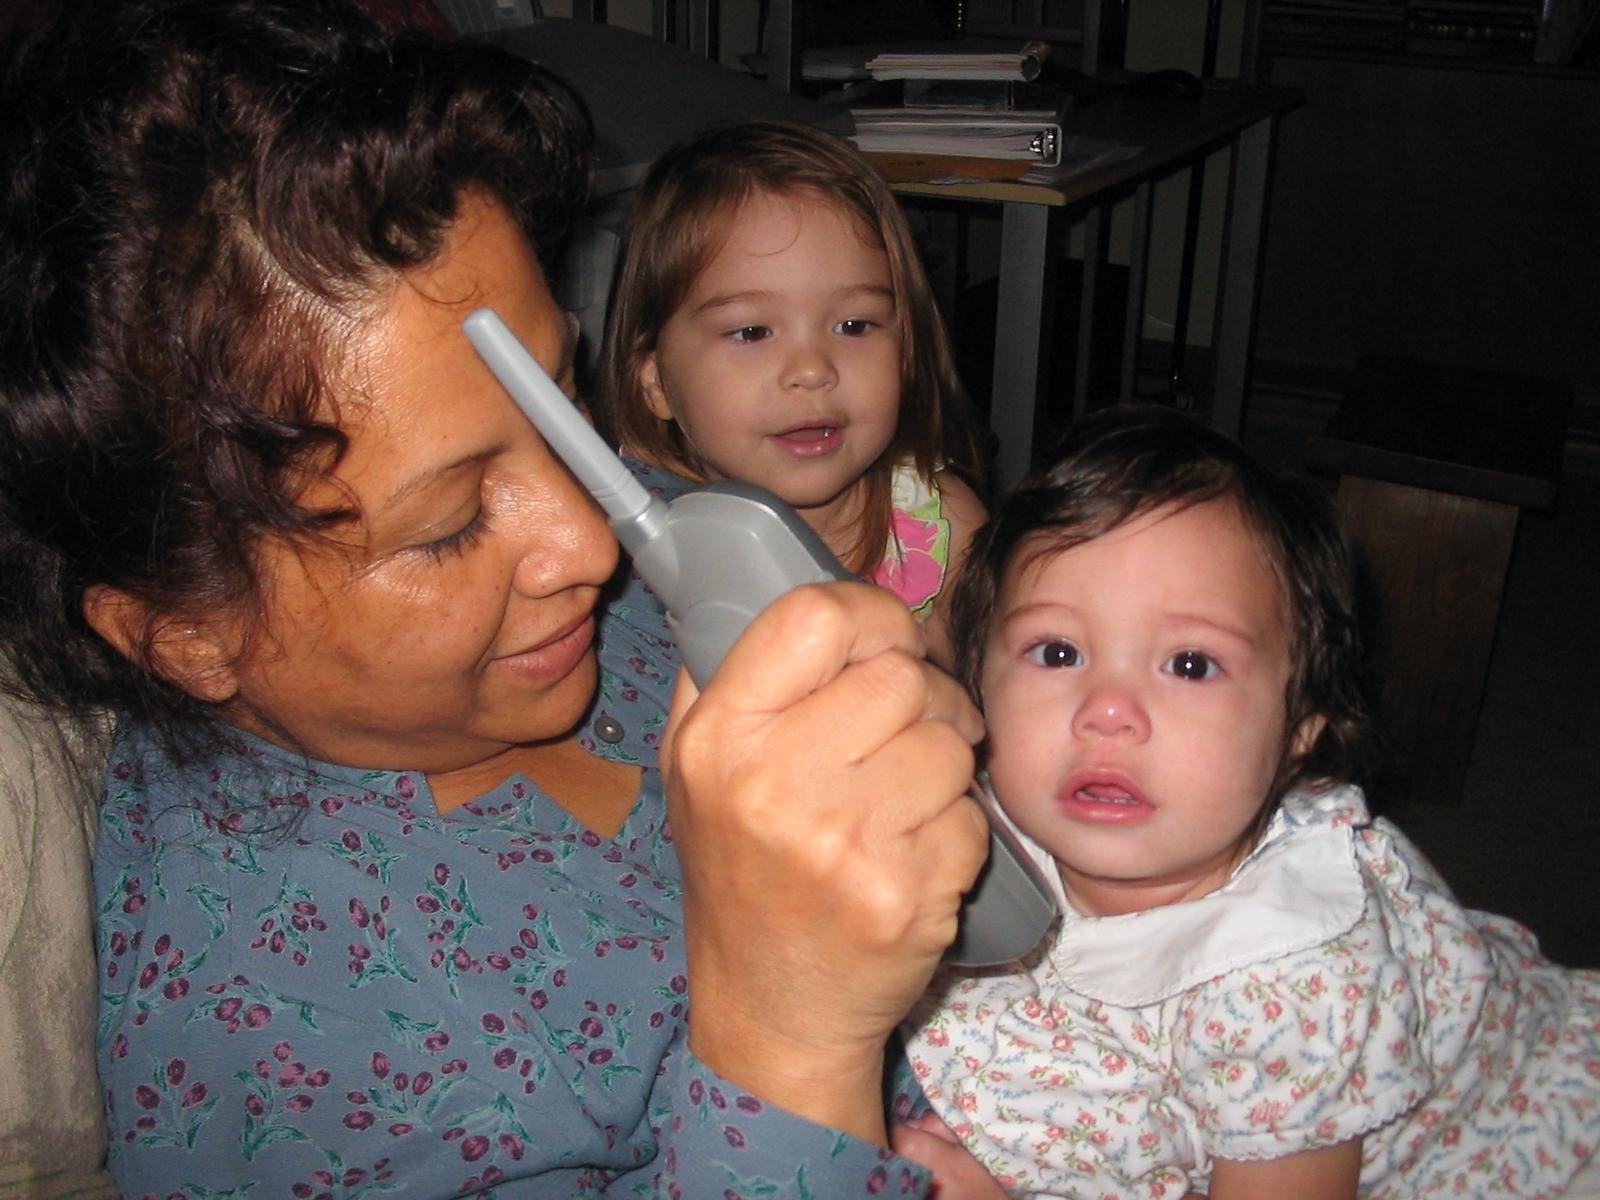 IMG_2104 - Heistheway baby Pelaiah talking Daddy deployment Guam Jamma Grandma Nana Anicia.JPG